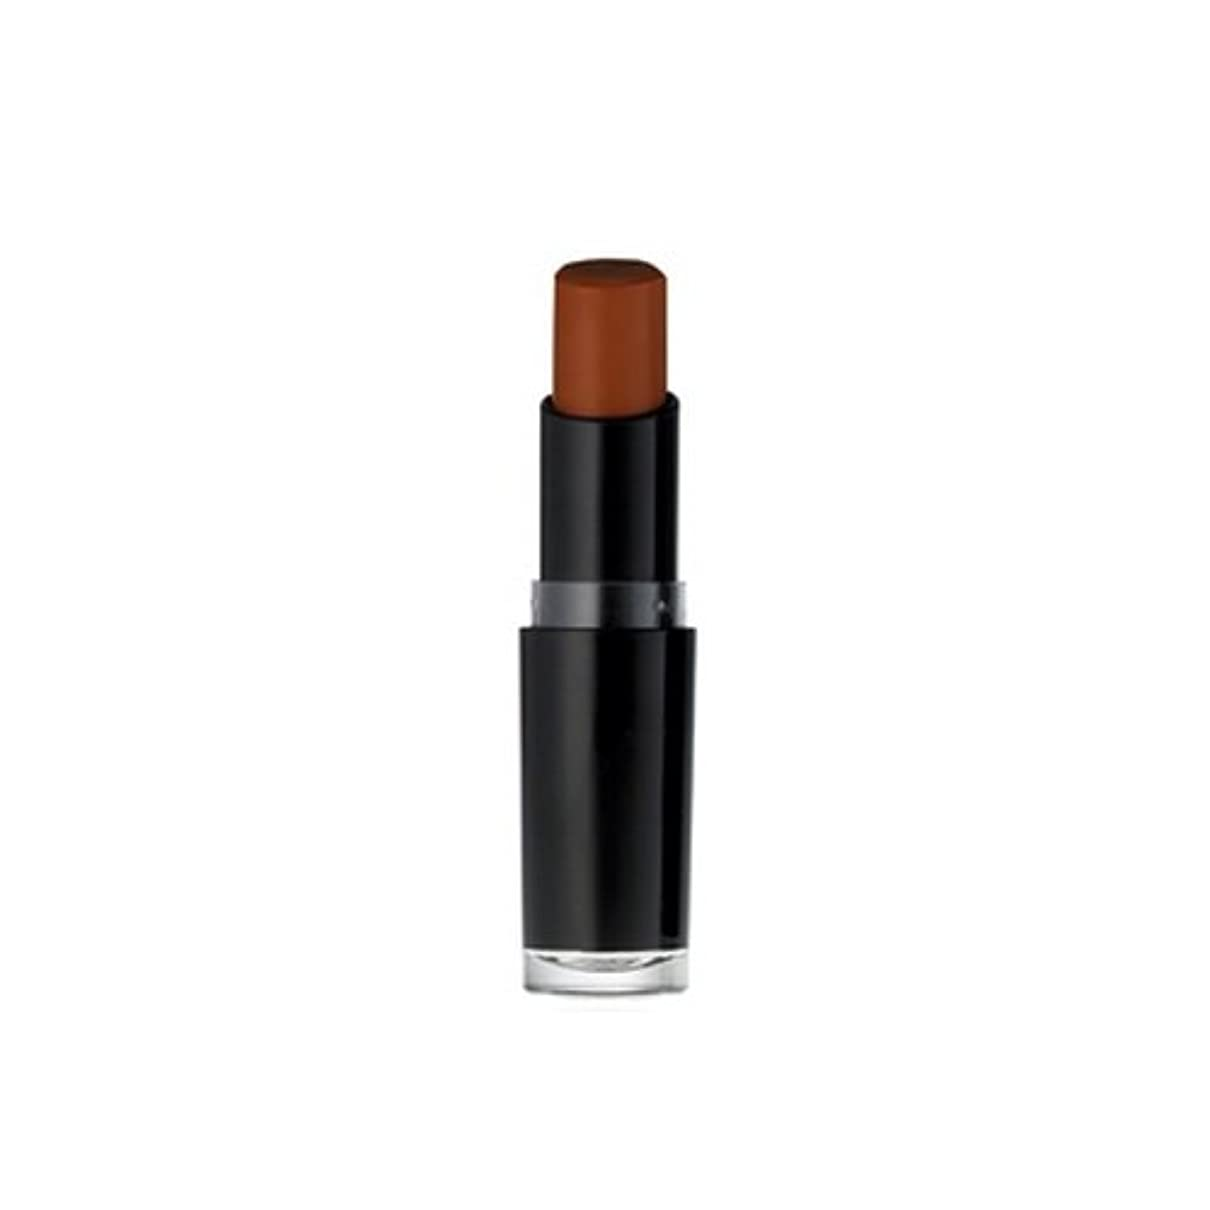 精神医学不機嫌自慢(6 Pack) WET N WILD Mega Last Matte Lip Cover - Mocha-licious (並行輸入品)